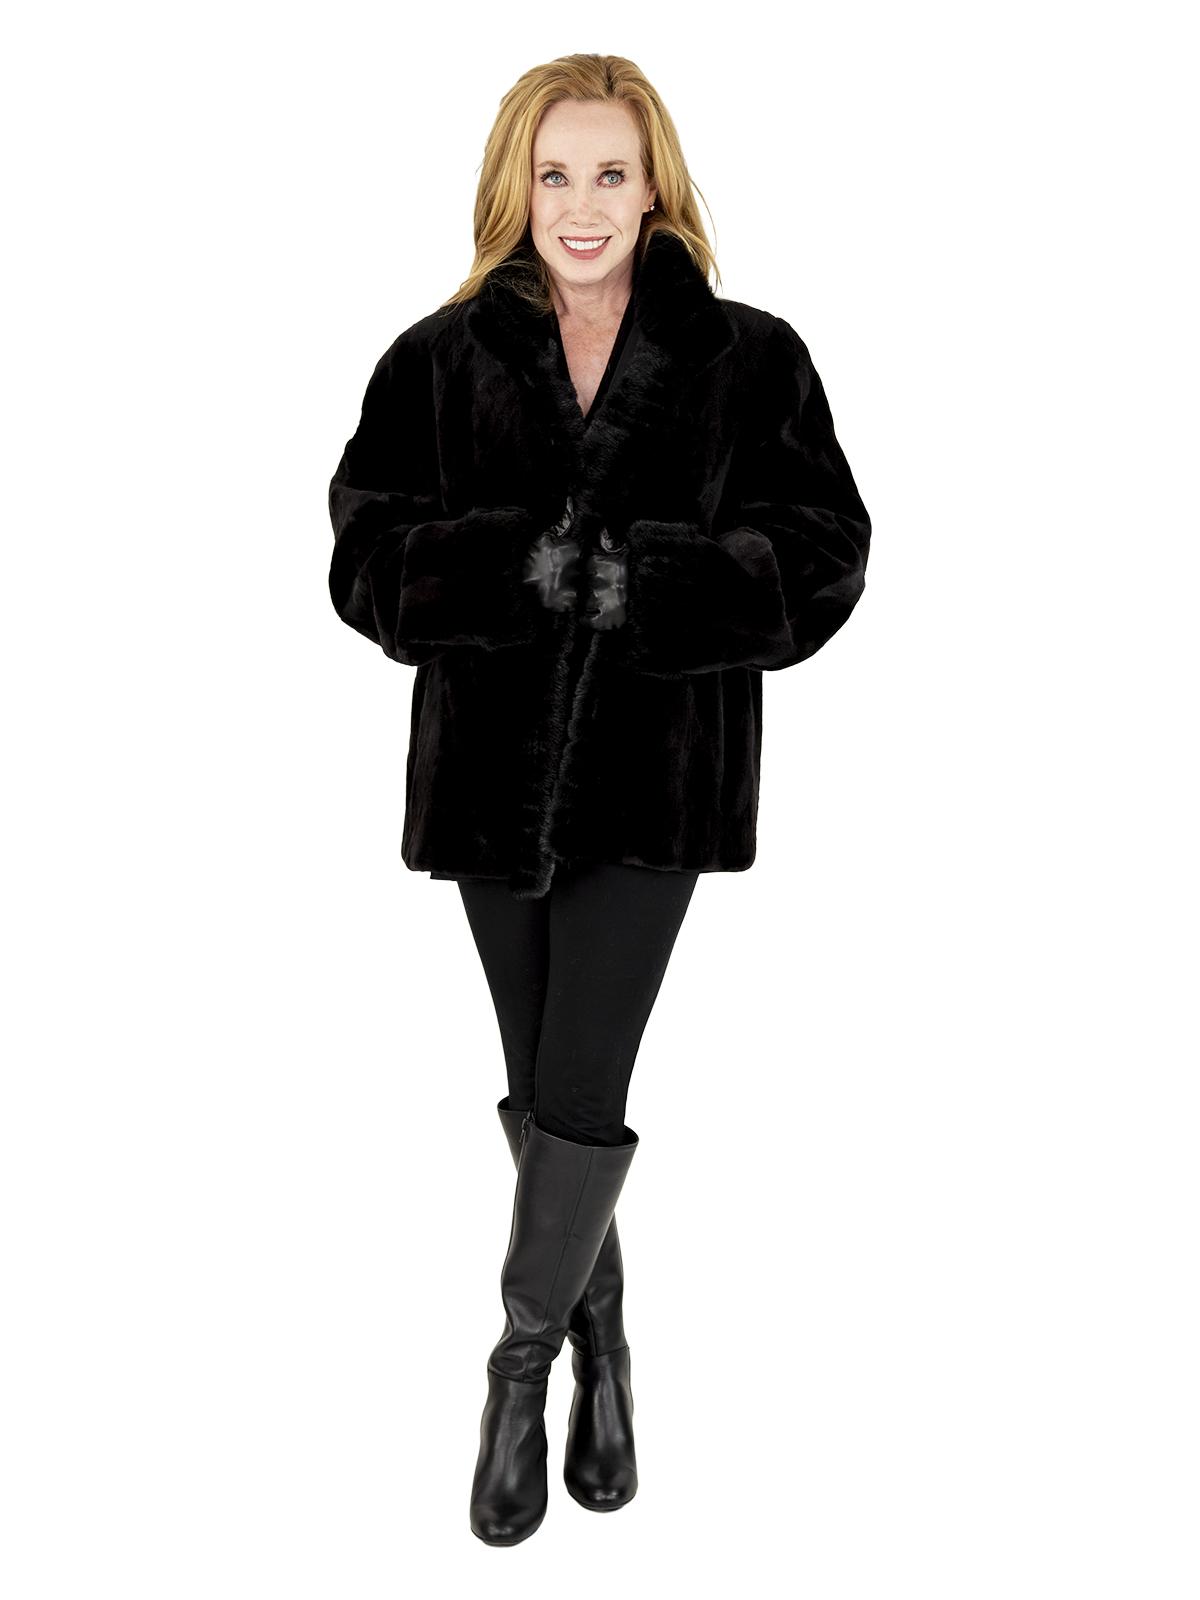 Woman's Black Sheared and Sculptured Mink Fur Jacket Reversible to Rain Taffeta